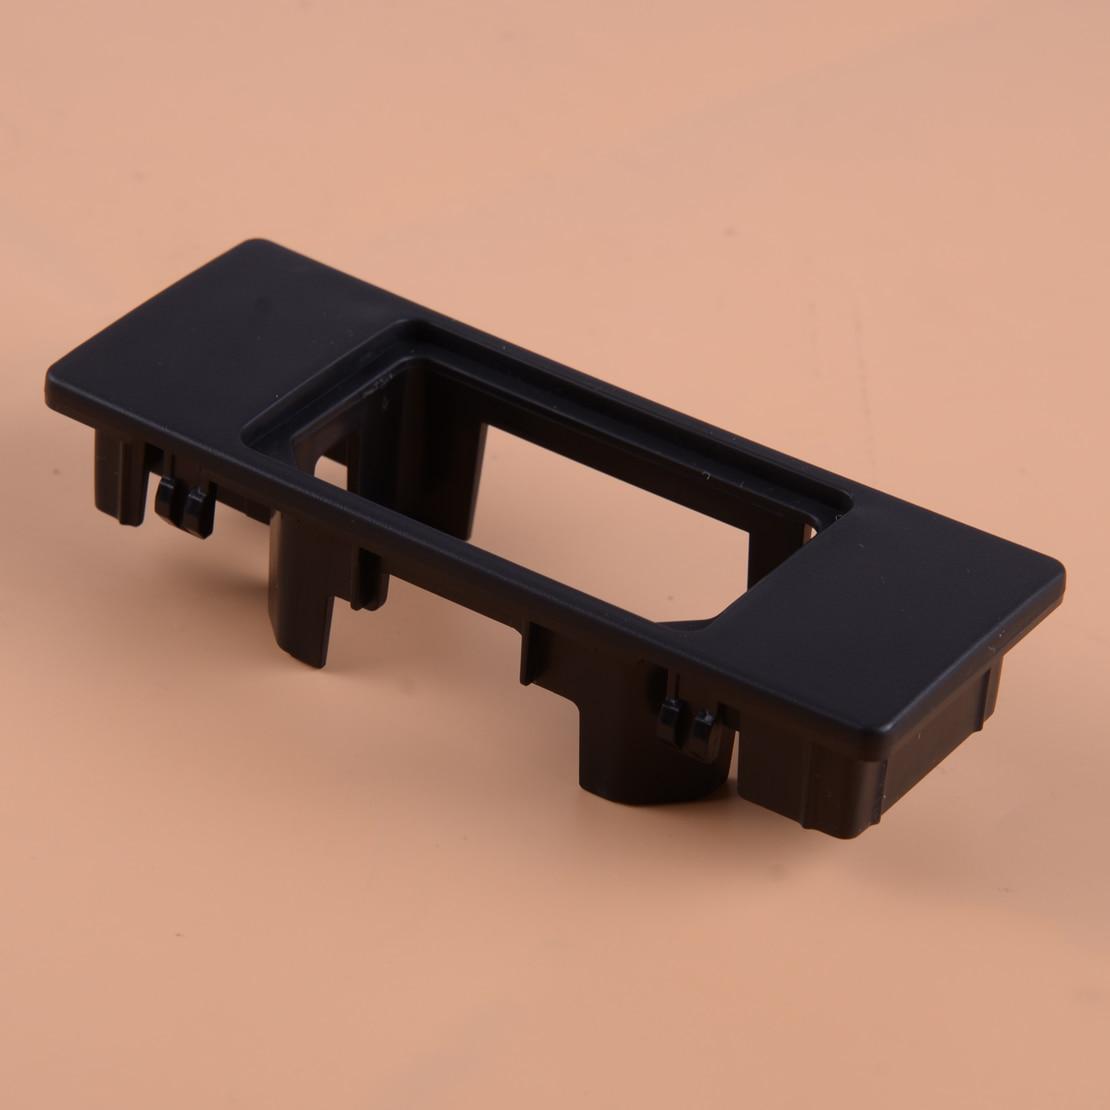 citall carro preto de plastico usb carplay interface modulo multi midia sync3 caixa hub capa apto